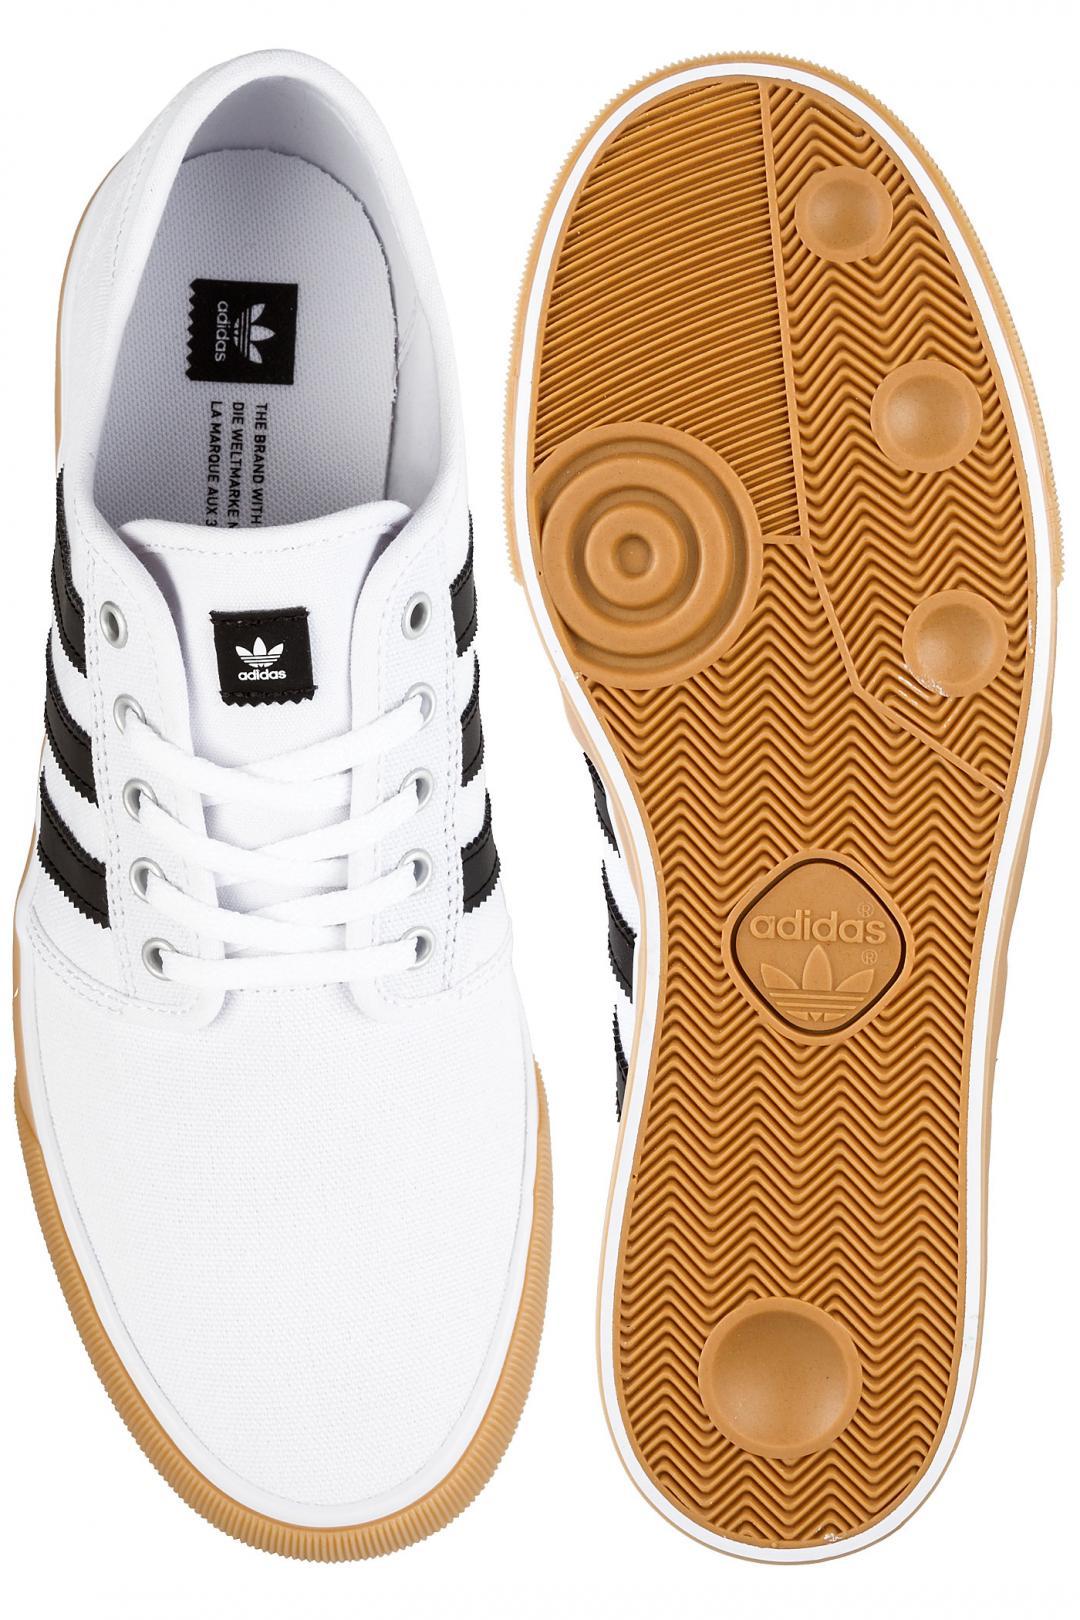 Uomo adidas Seeley Decon white core black white   Scarpe da skate